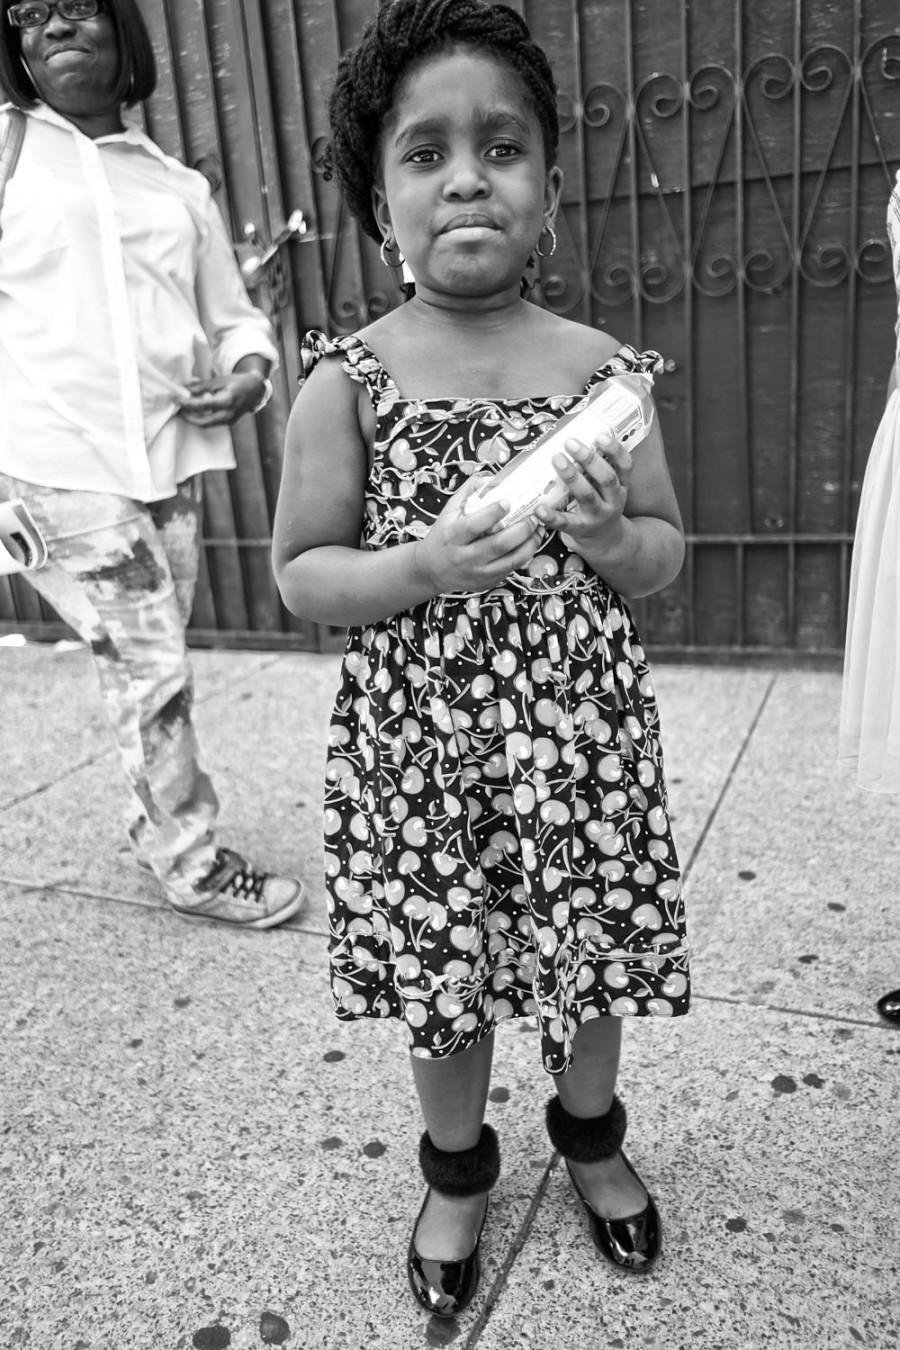 Everybody loves Harlem